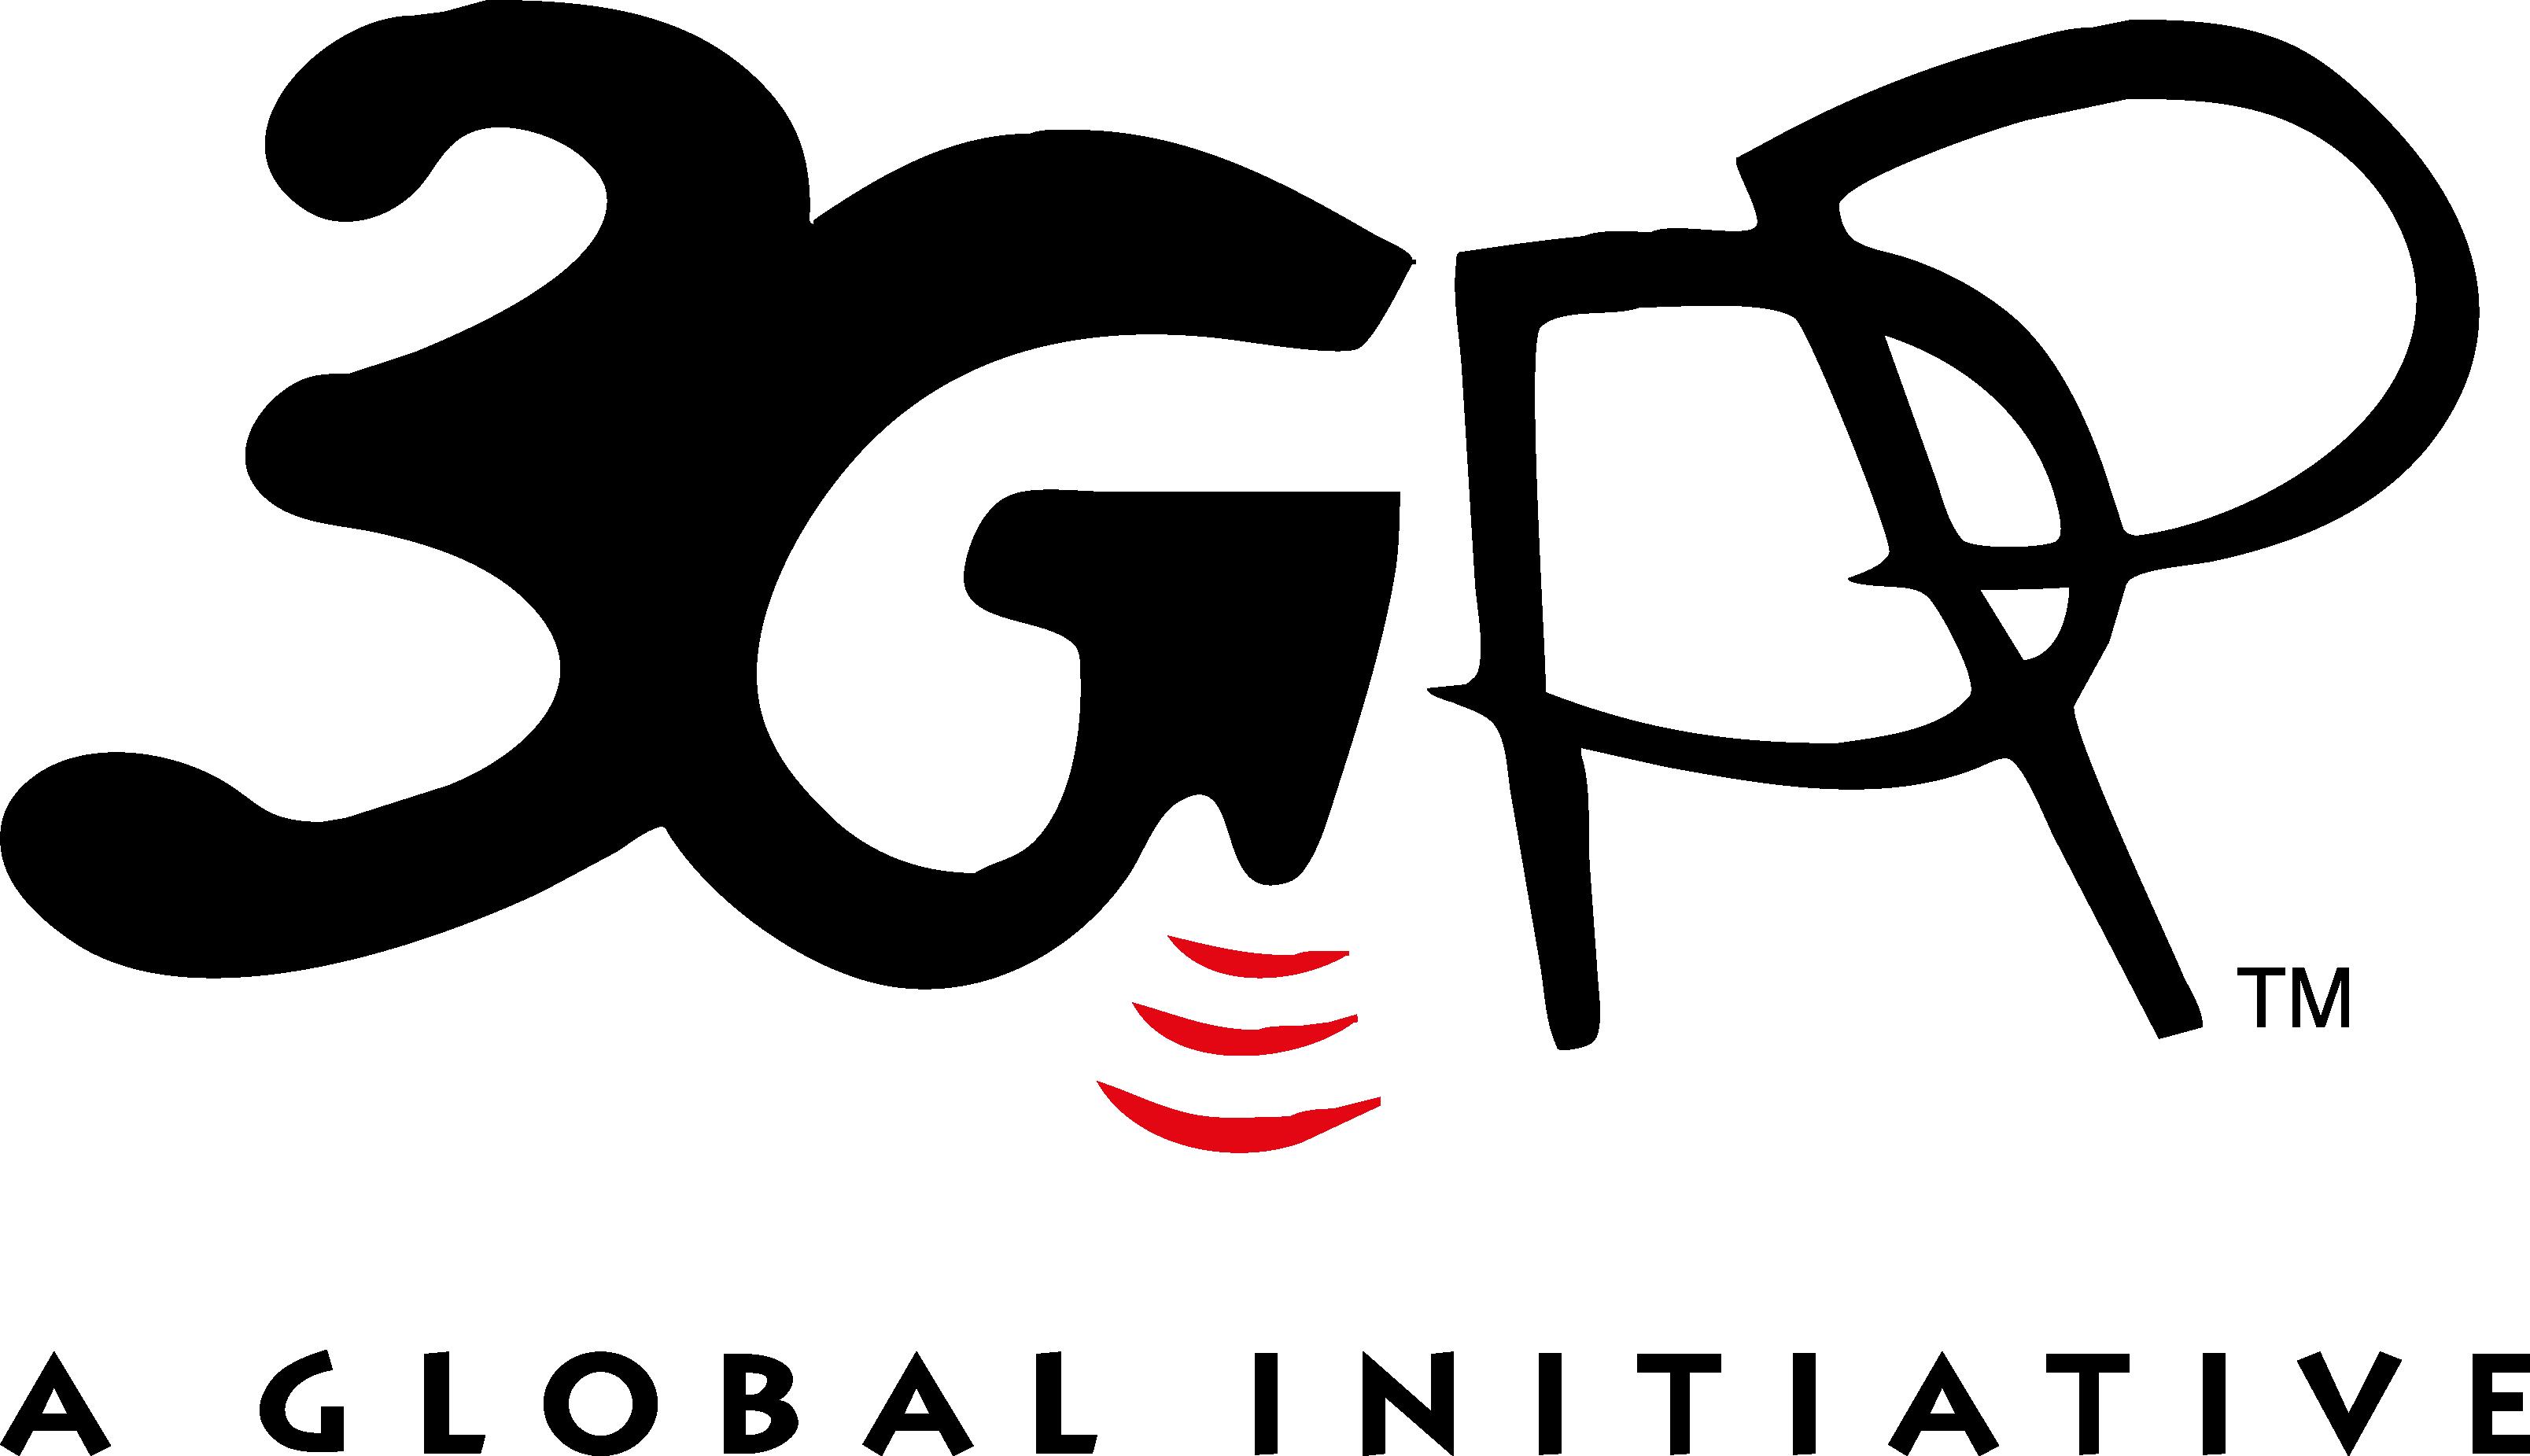 3GPP critical communications standardisation - progress, present and future